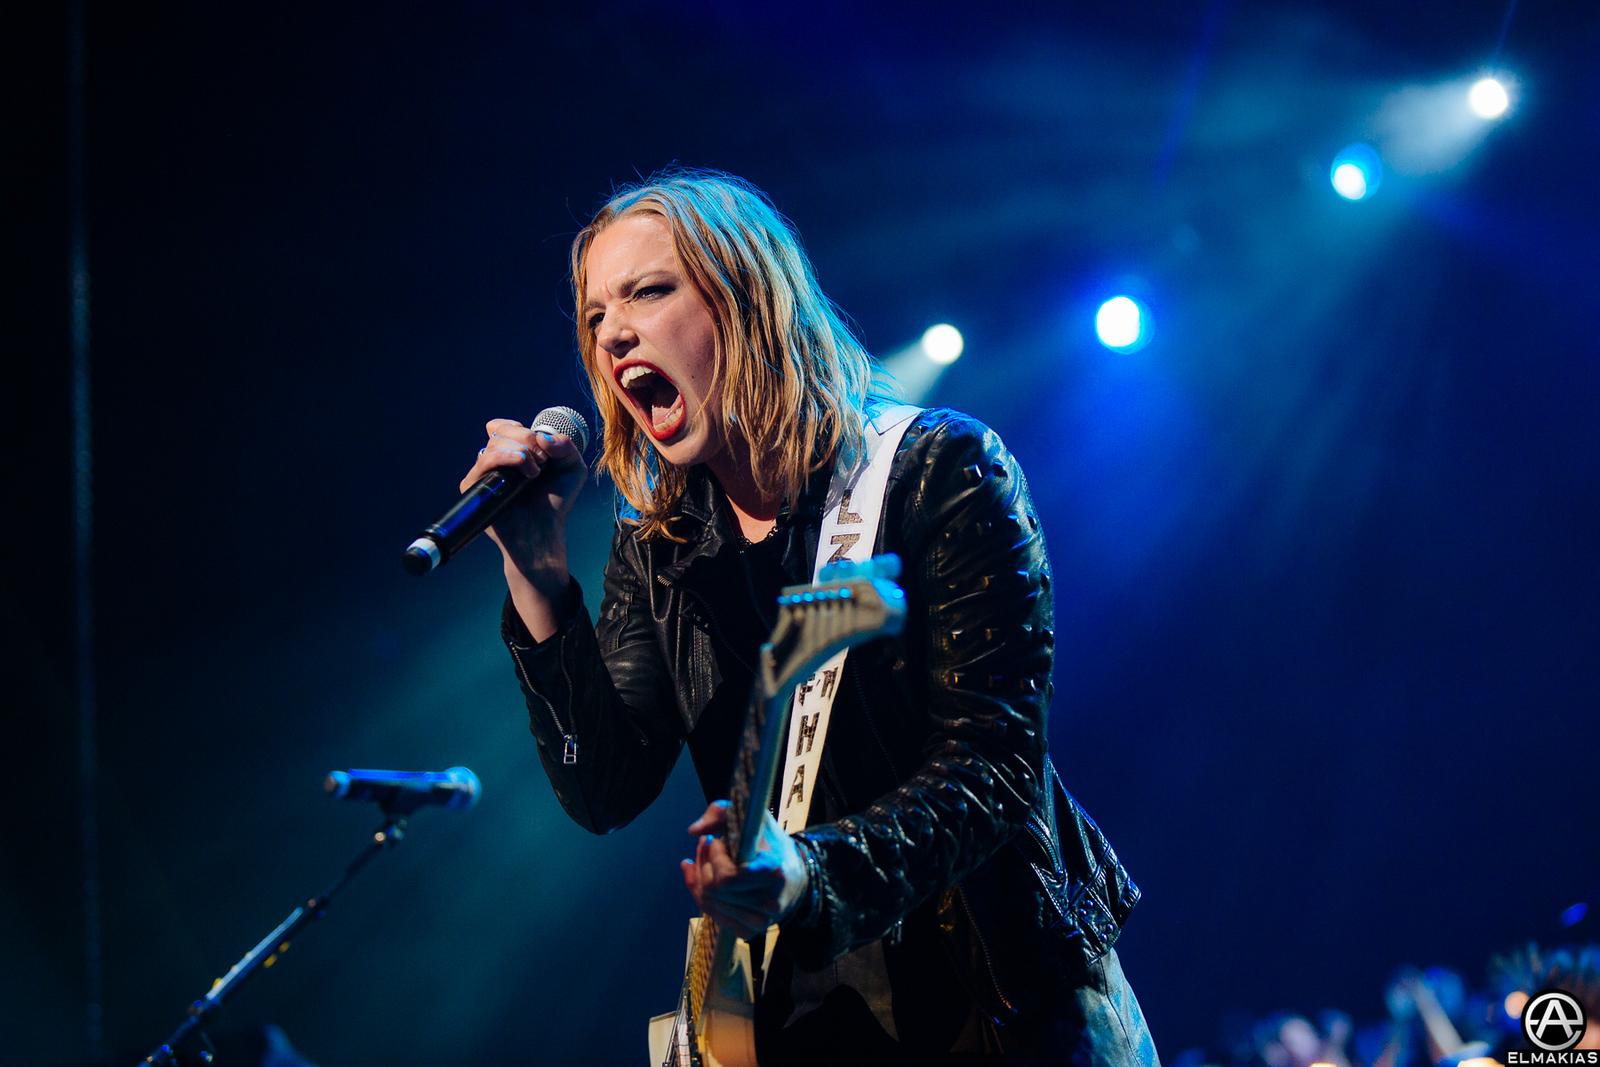 Lzzy Hale of Halestorm live at the Alternative Press Music Awards 2015 by Adam Elmakias